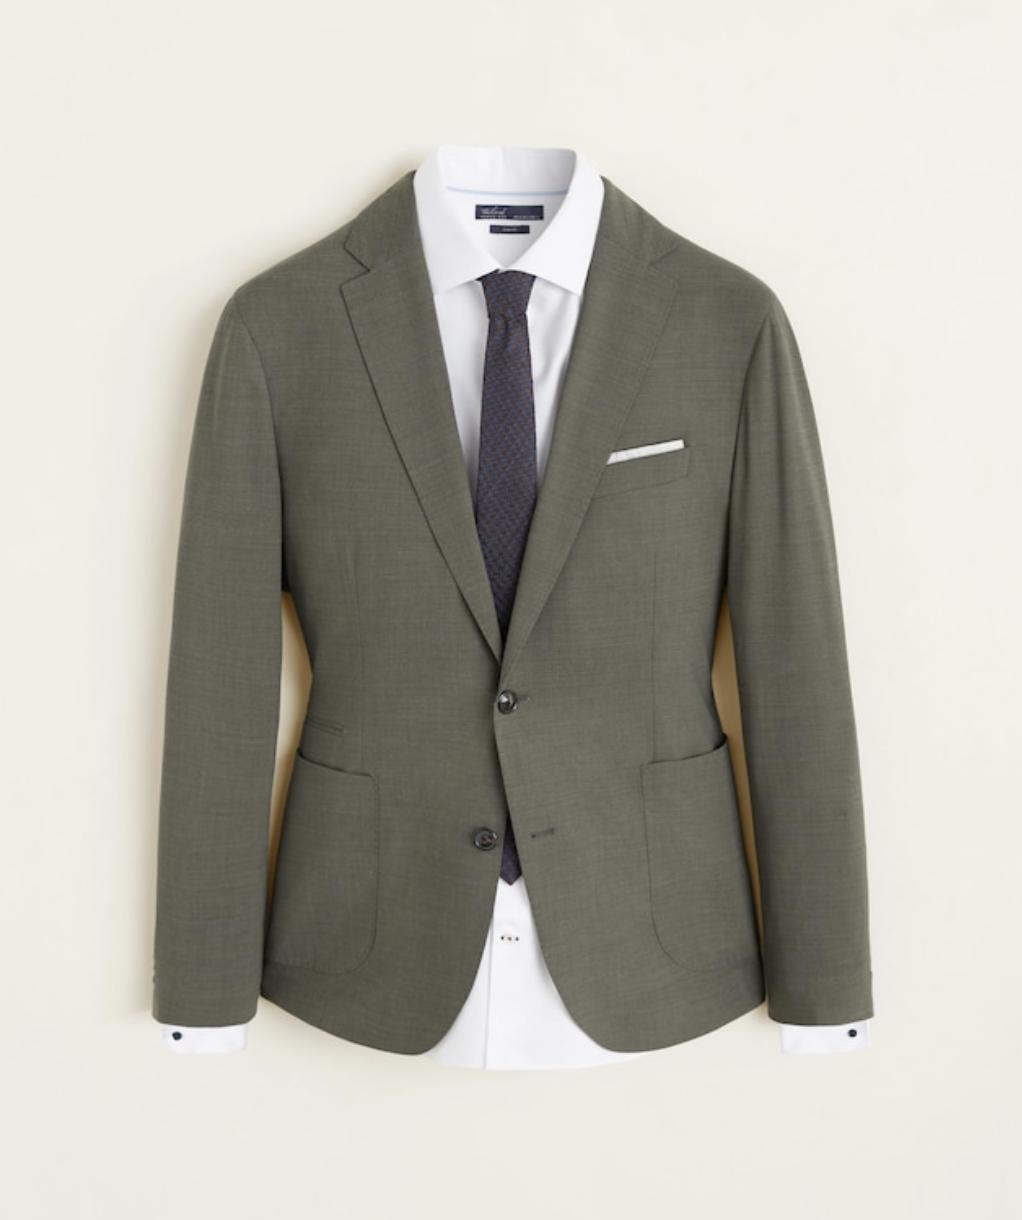 traje verde hombre, tendencia traje, moda traje